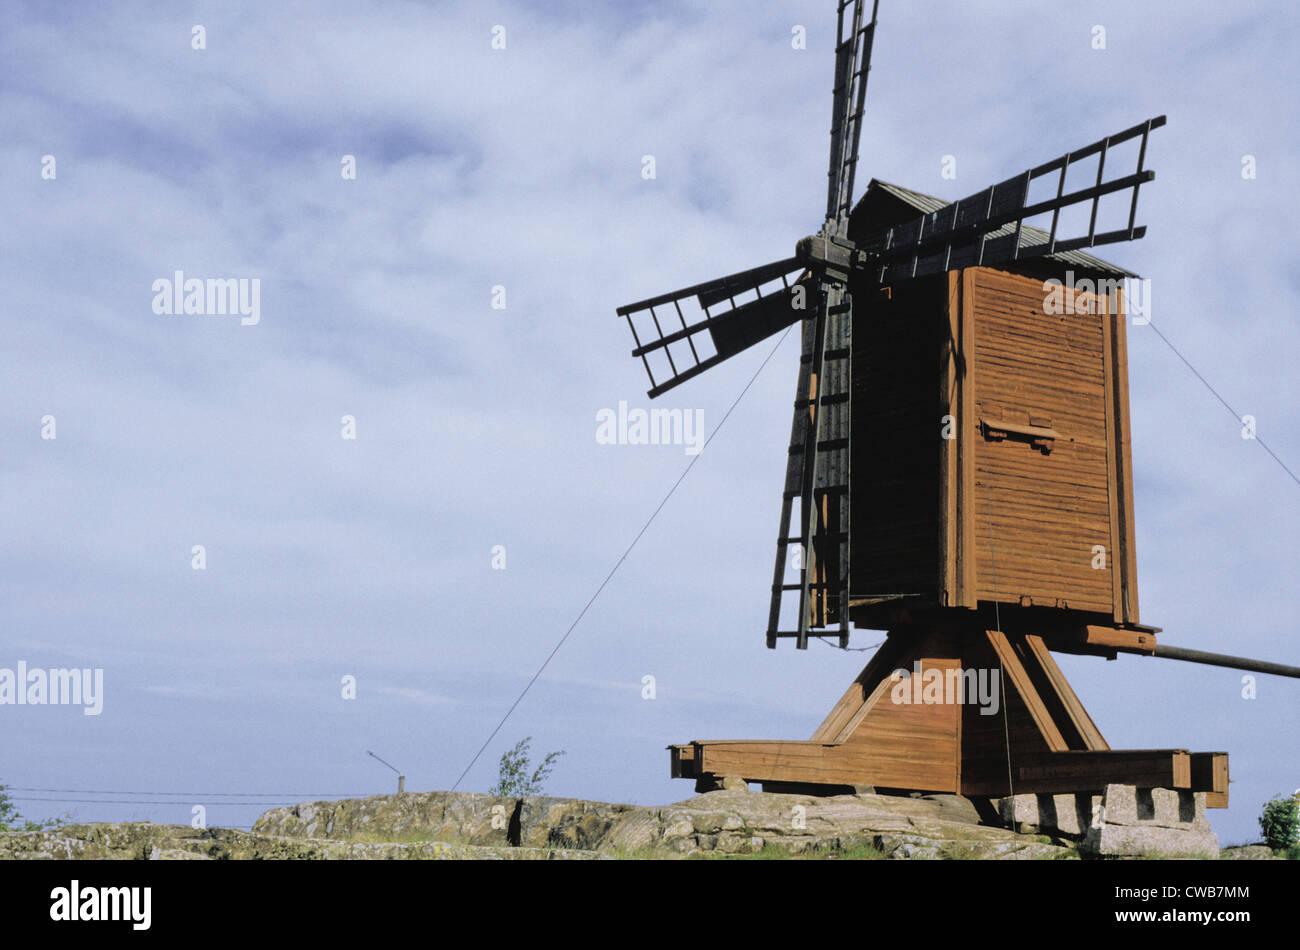 A historic post mill (windmill) in Kristinestad, Finland - Stock Image